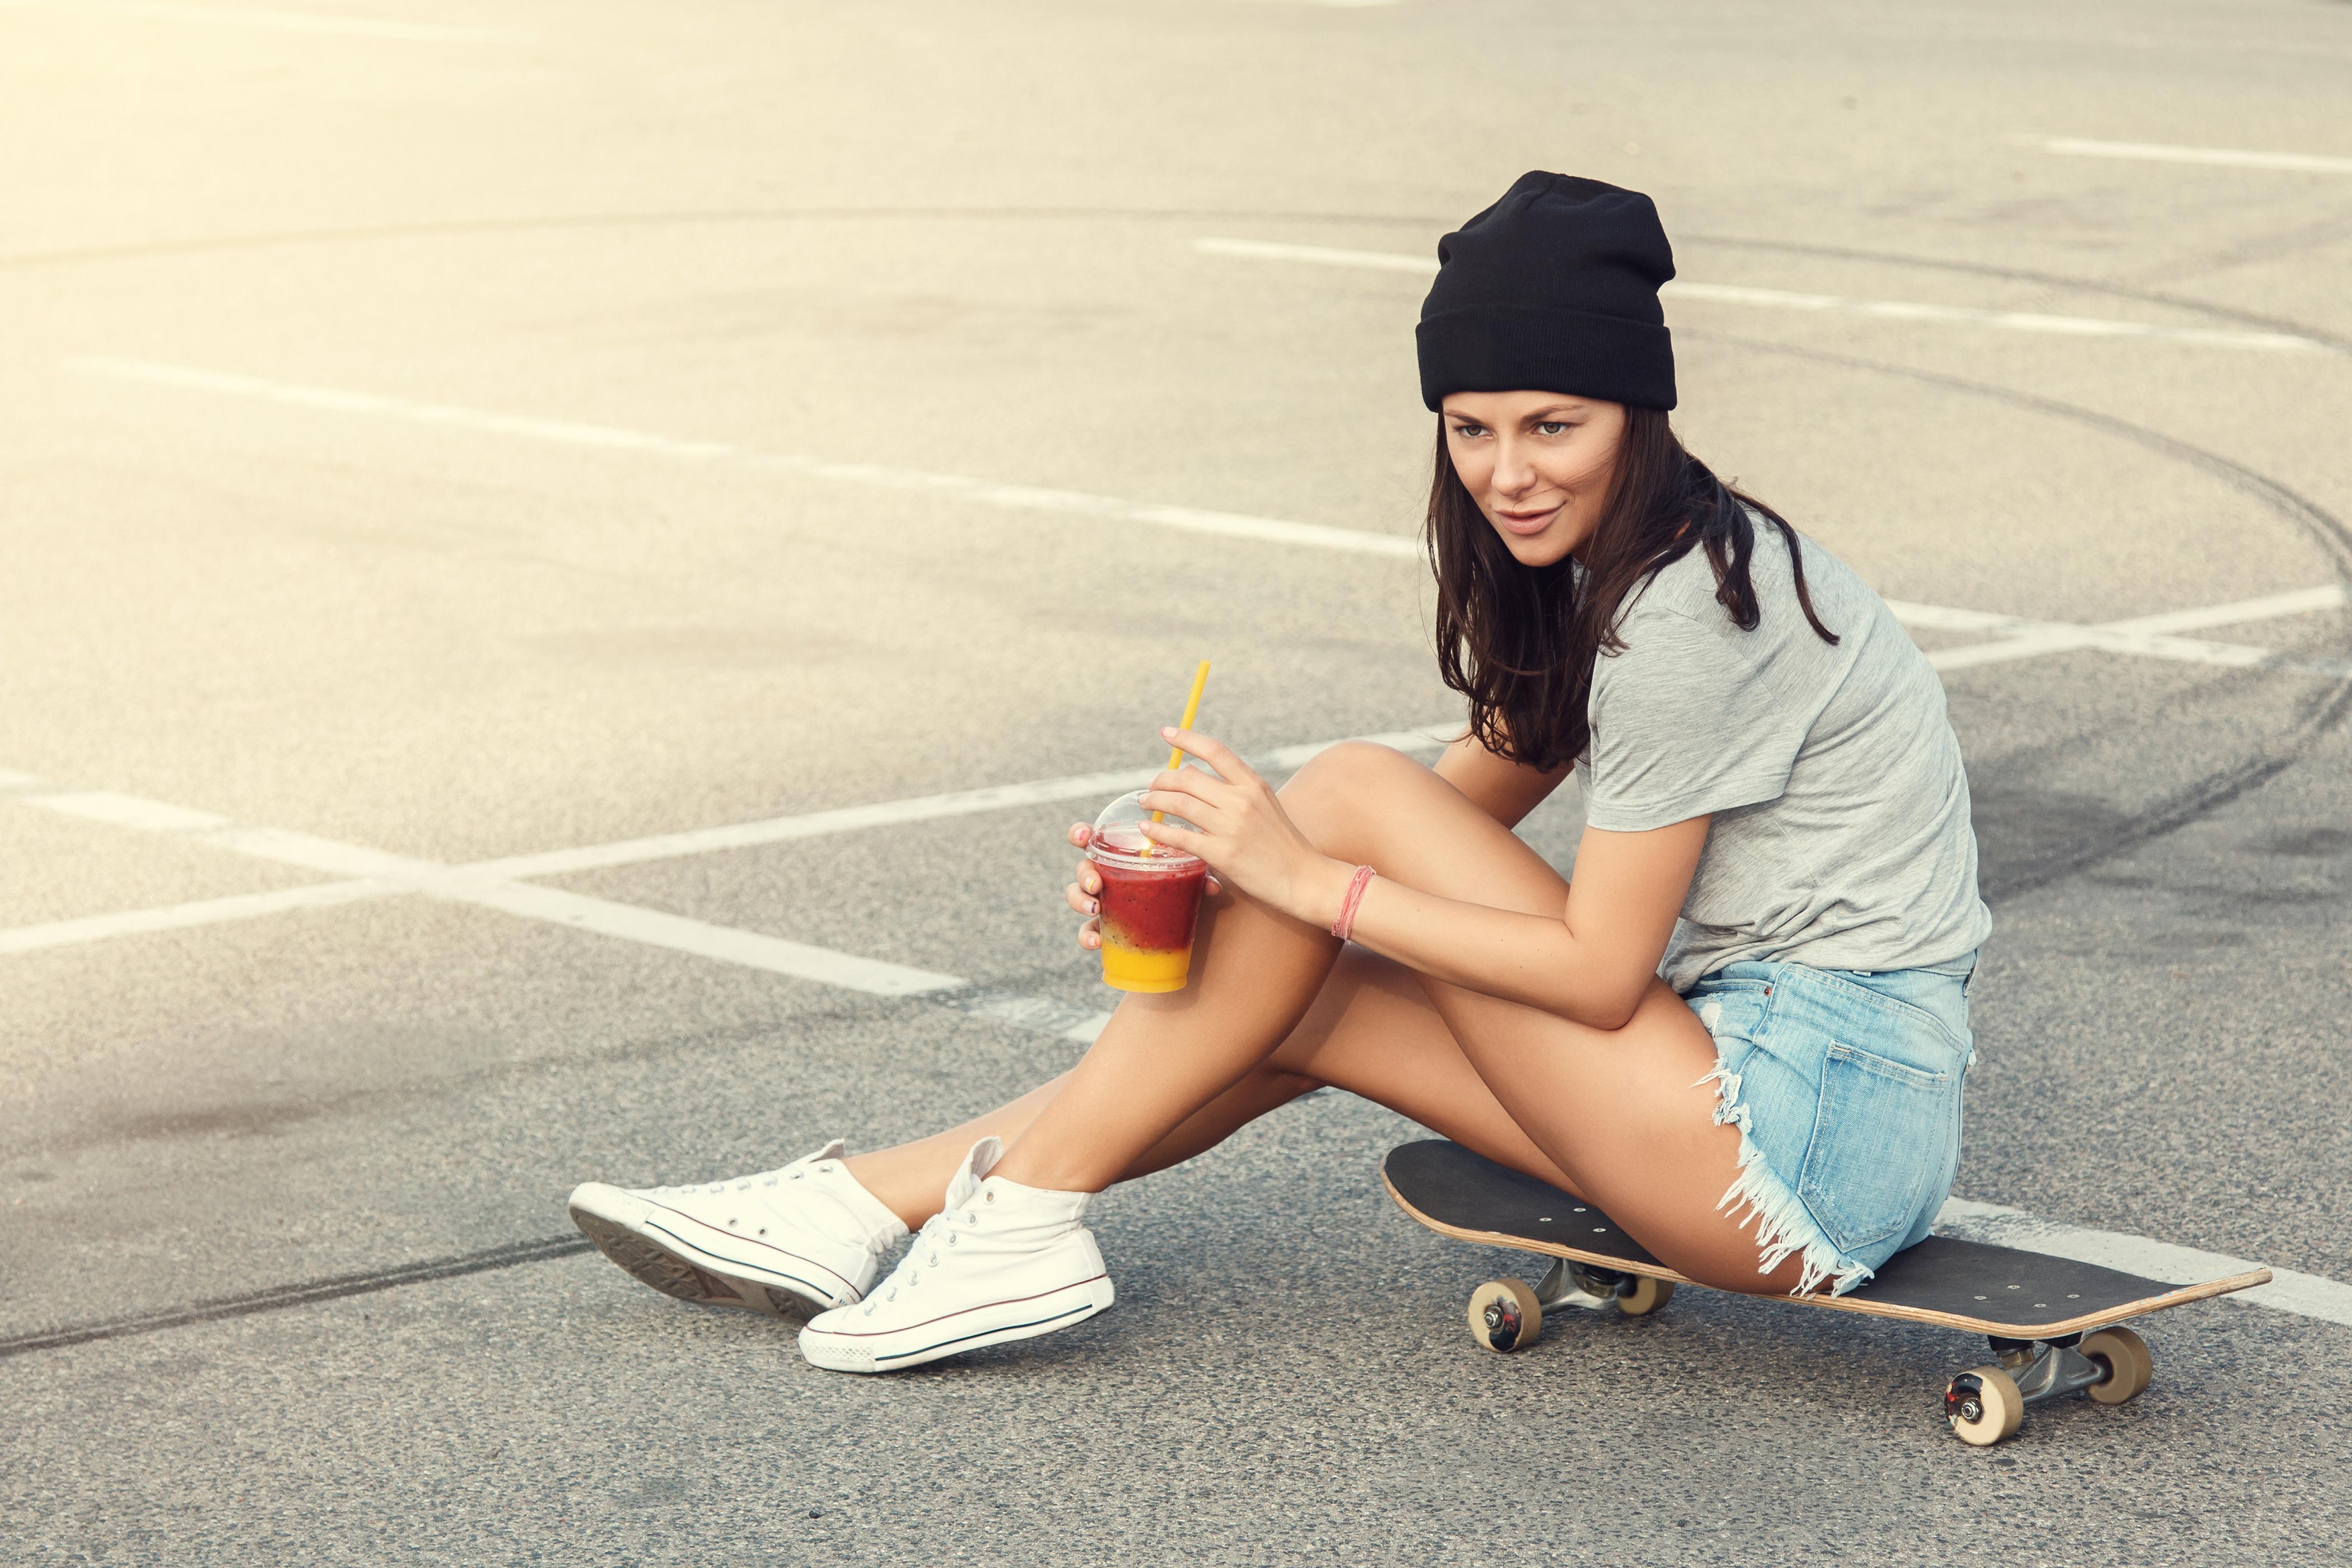 Девушка на скейте картинки